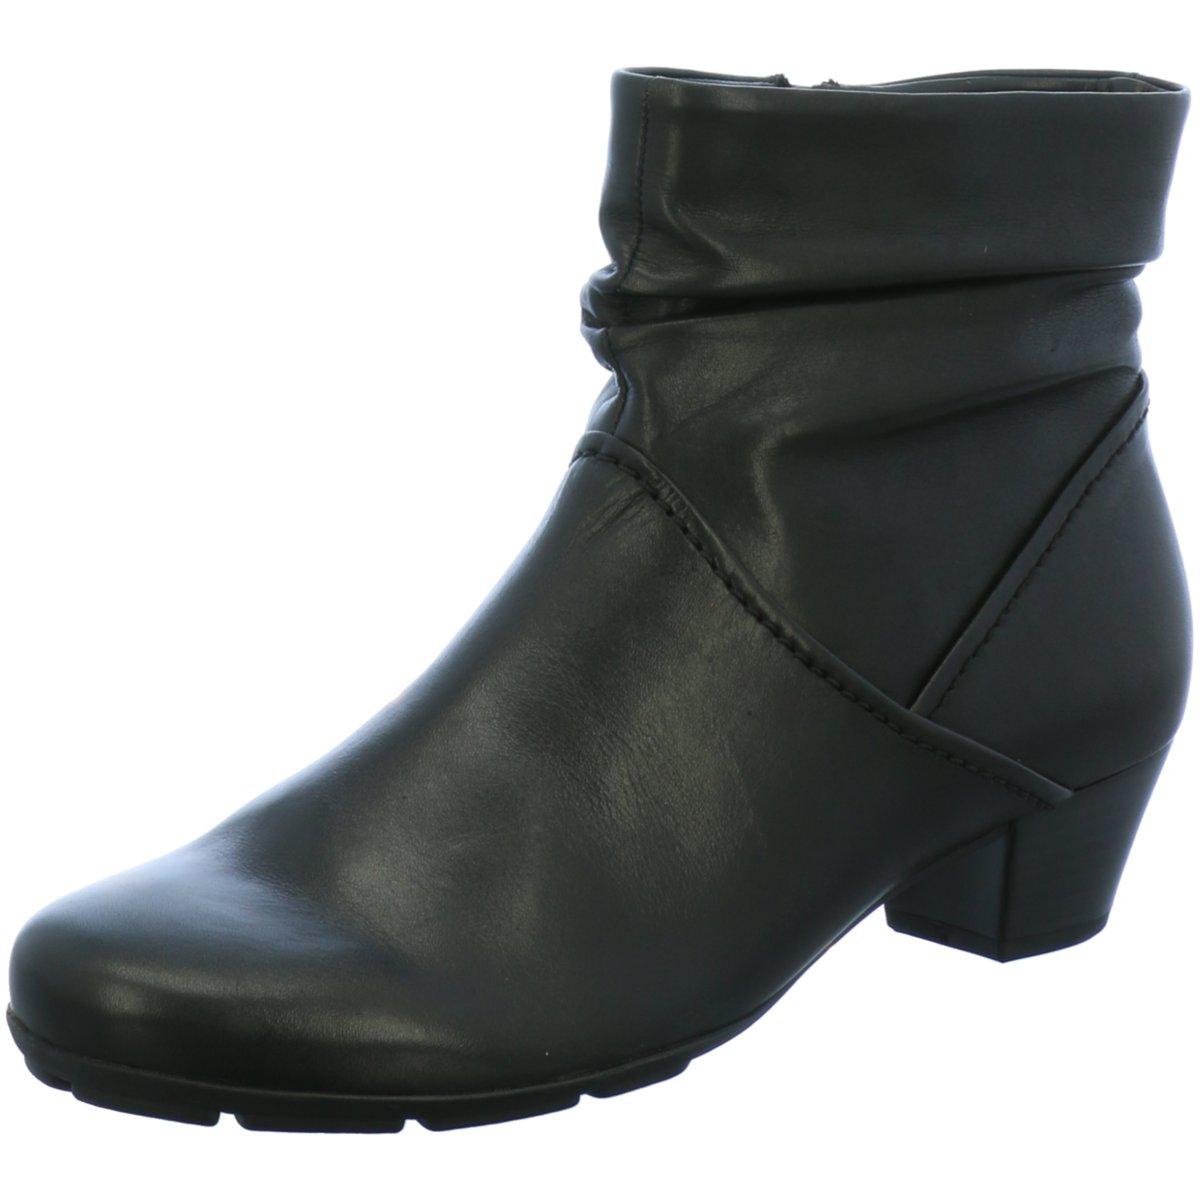 NEU Gabor Damen Stiefeletten 55.637.87 schwarz 71117